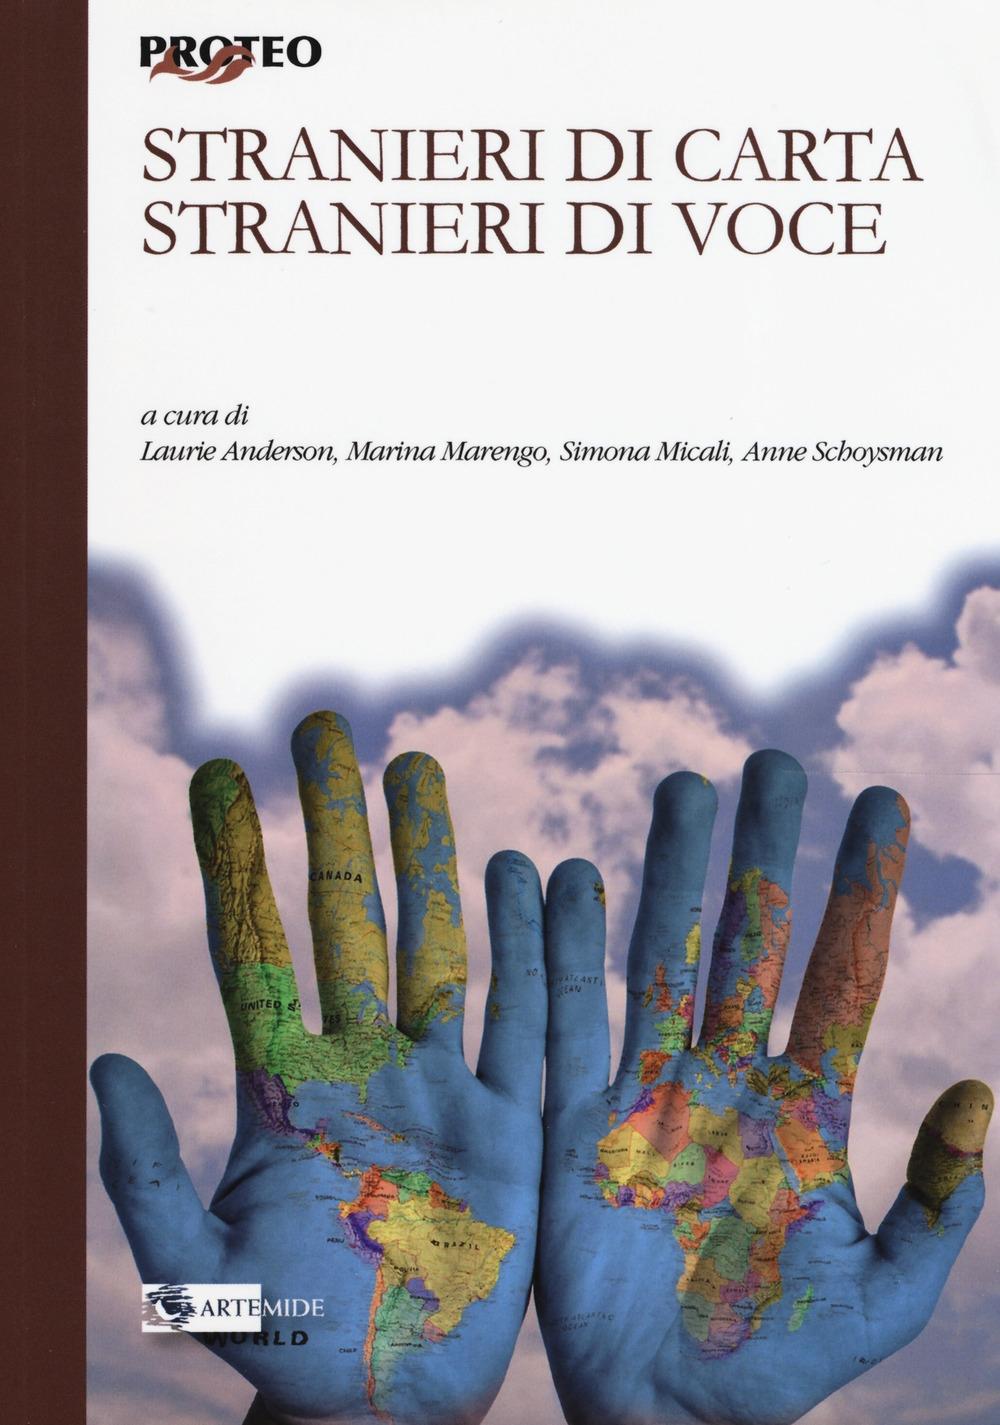 Stranieri di carta, stranieri di voce